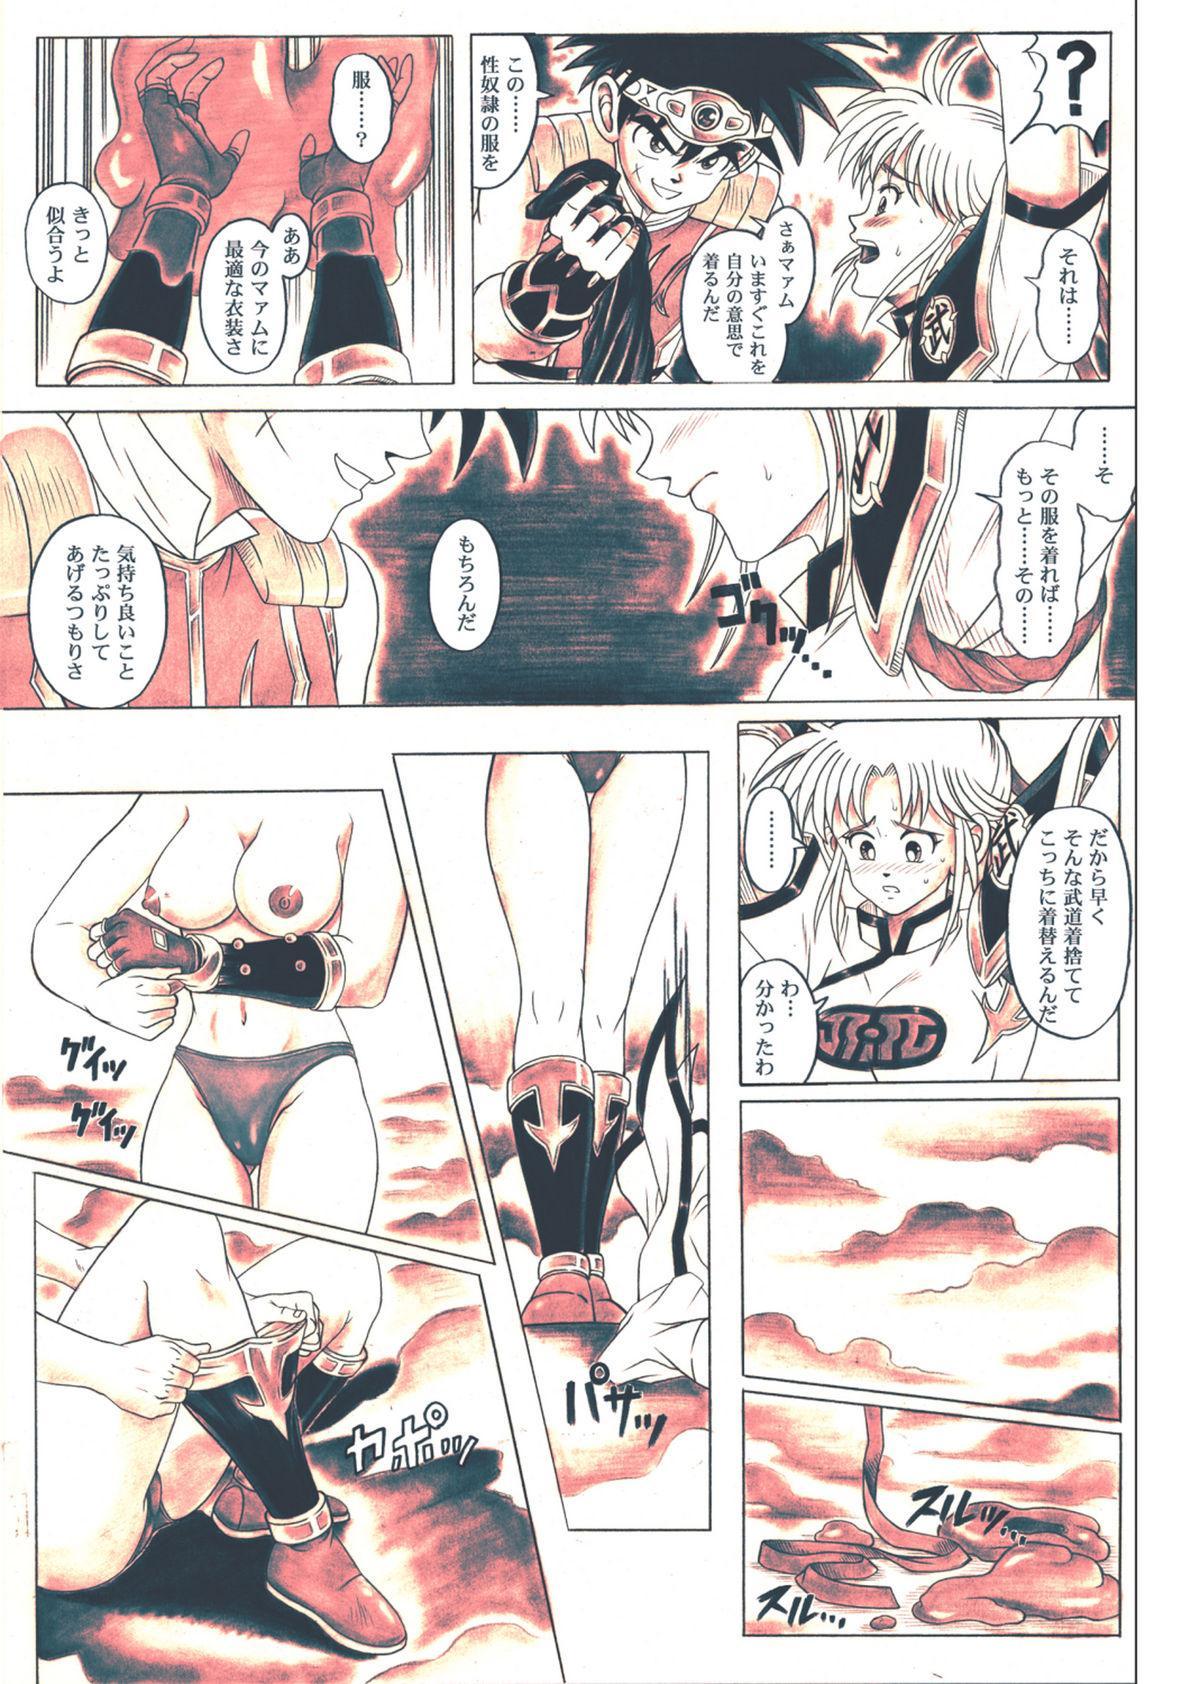 [Cyclone (Reizei, Izumi)] STAR TAC IDO ~Youkuso Haja no Doukutsu he~ Chuuhen Download edition (Dragon Warrior: Dai's Great Adventure) [Digital] 126